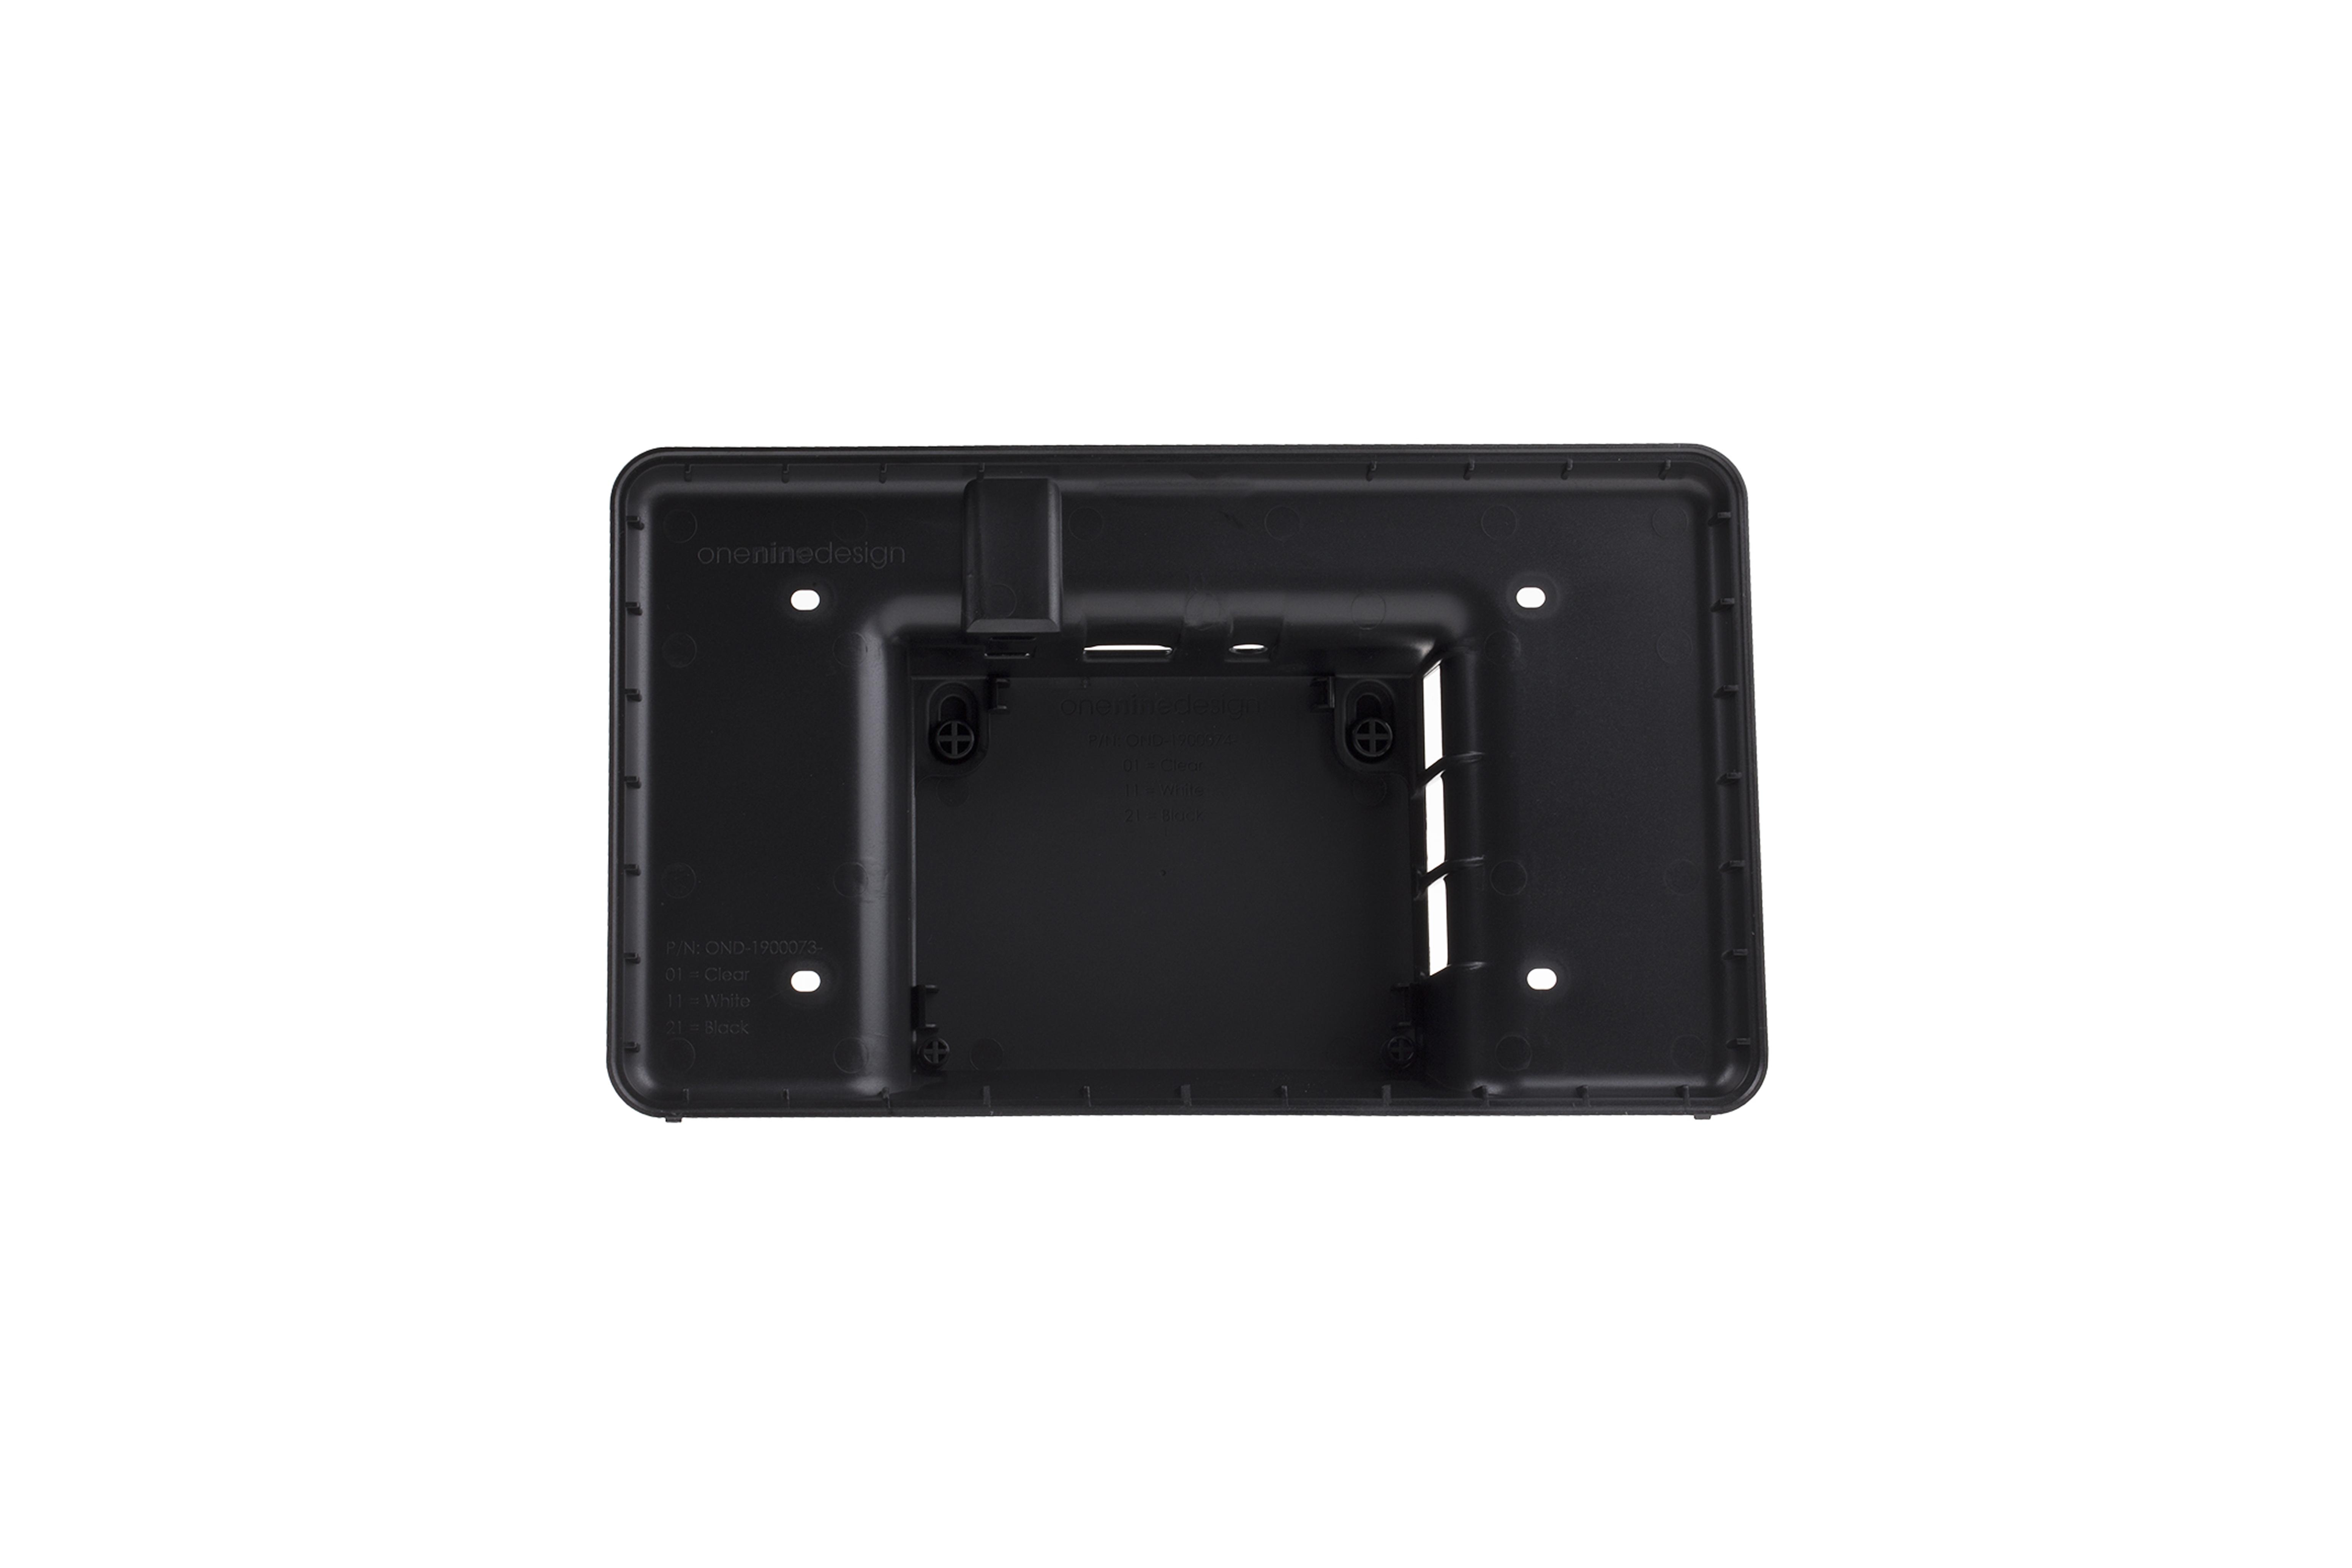 RaspberryPi touchscreen-behuizing - zwart